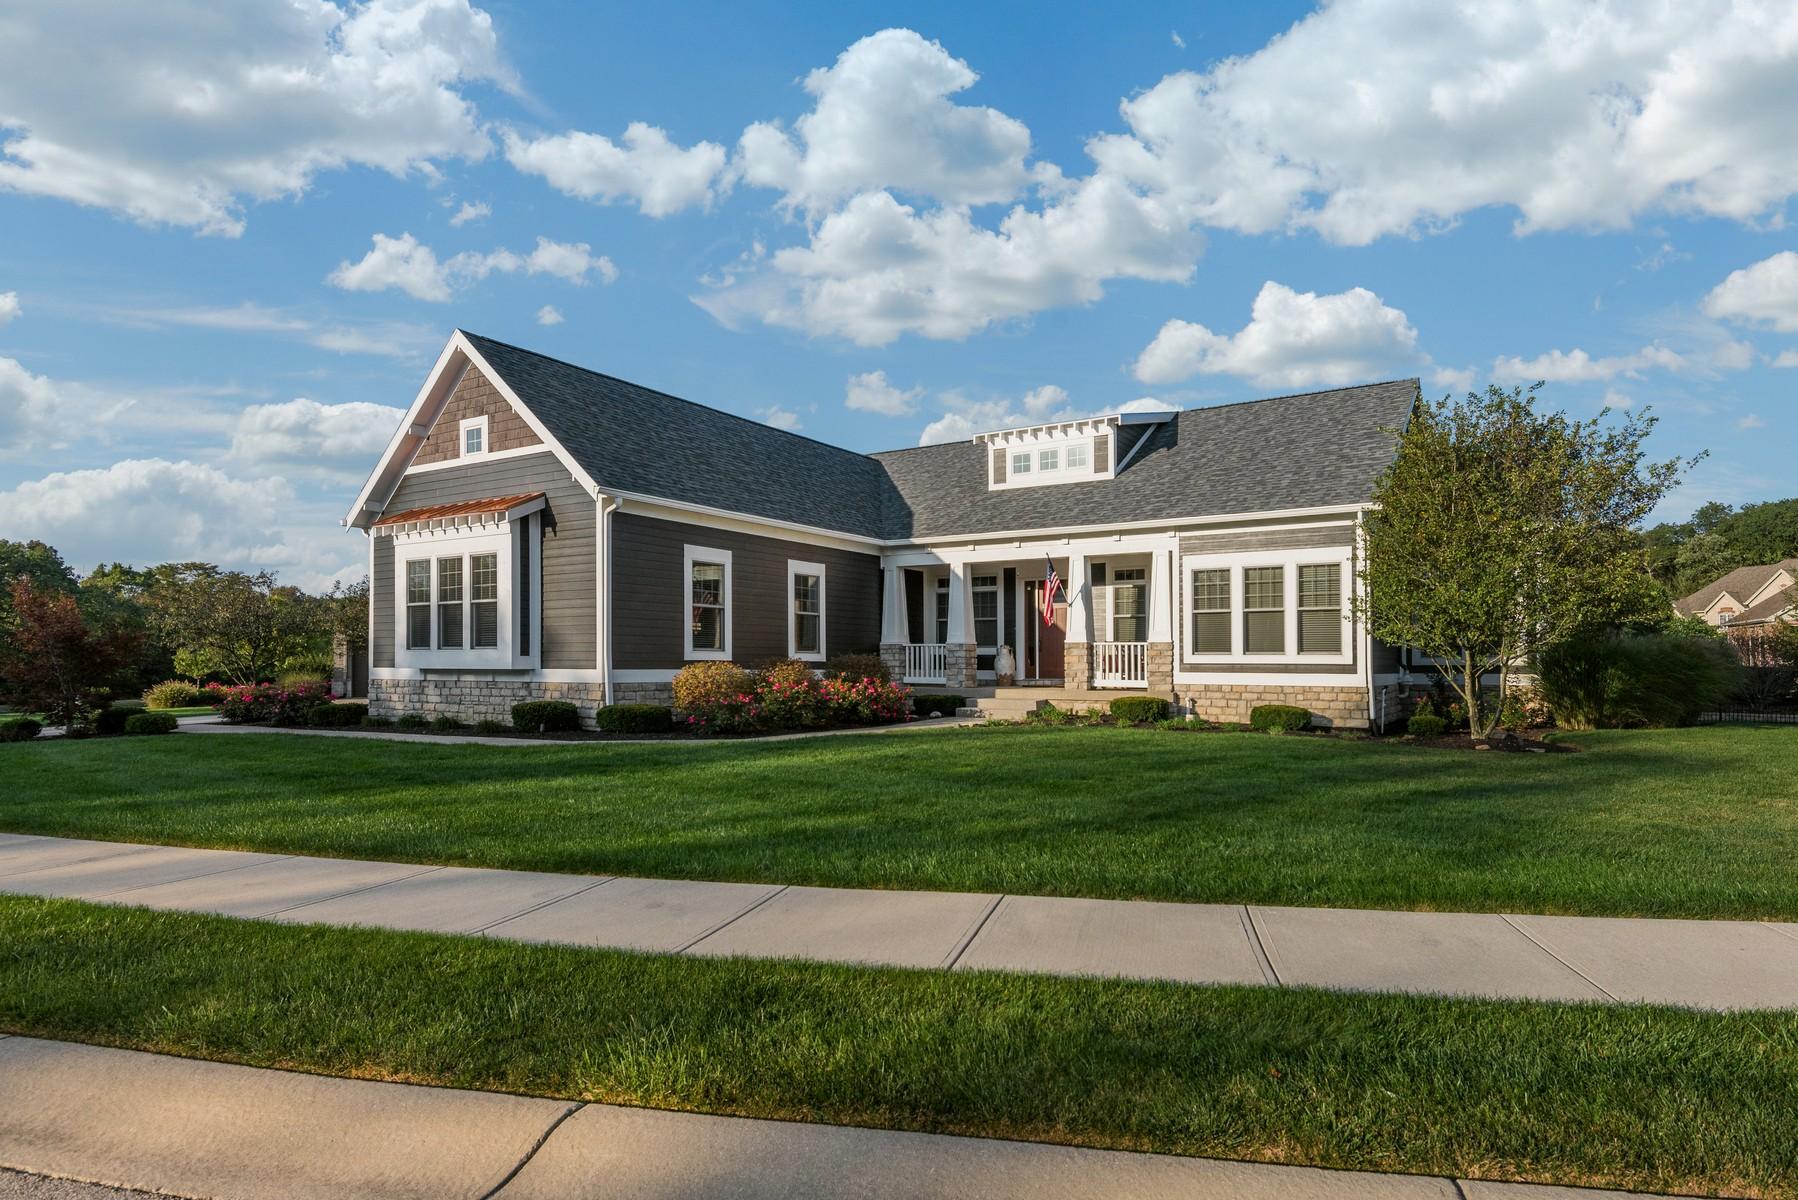 Single Family Home for Sale at Elegant Ranch Home in Carmel 13211 Carmichael Lane Carmel, Indiana 46032 United States